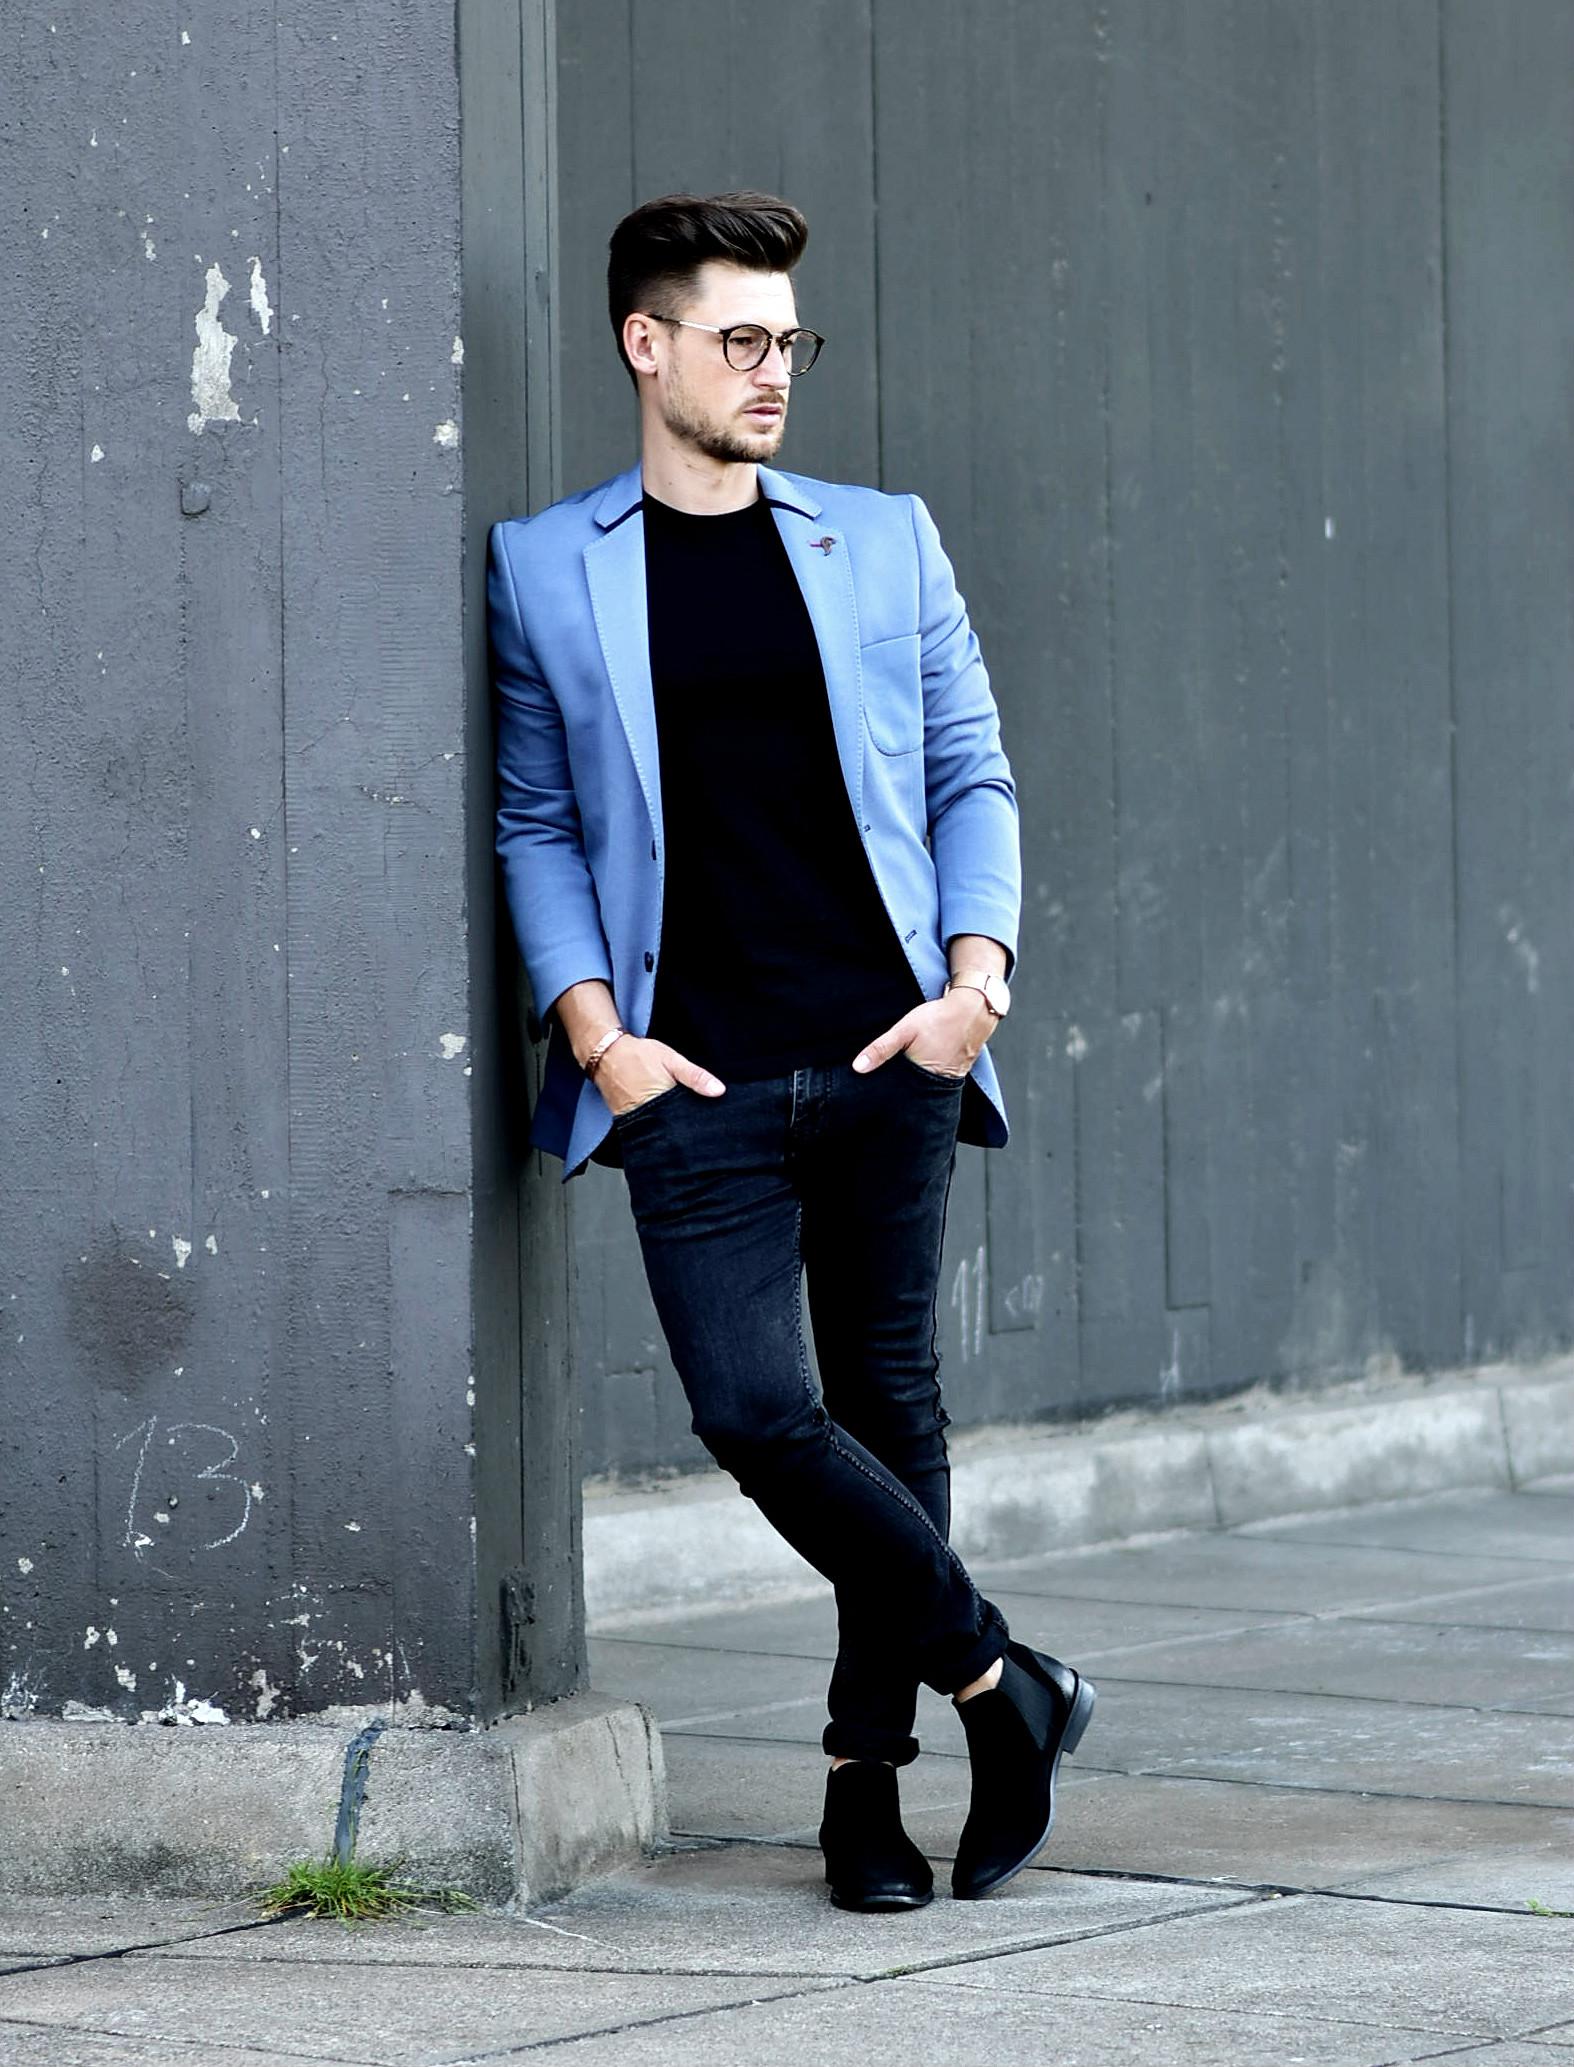 Tommeezjerry-Styleblog-Männerblog-Männer-Modeblog-Berlin-Berlinblog-Outfit-Streetlook-Royalblauer-Blazer-Royalblue-All-Black-Look-Chelsea-Boots-Skinny-Jeans-3